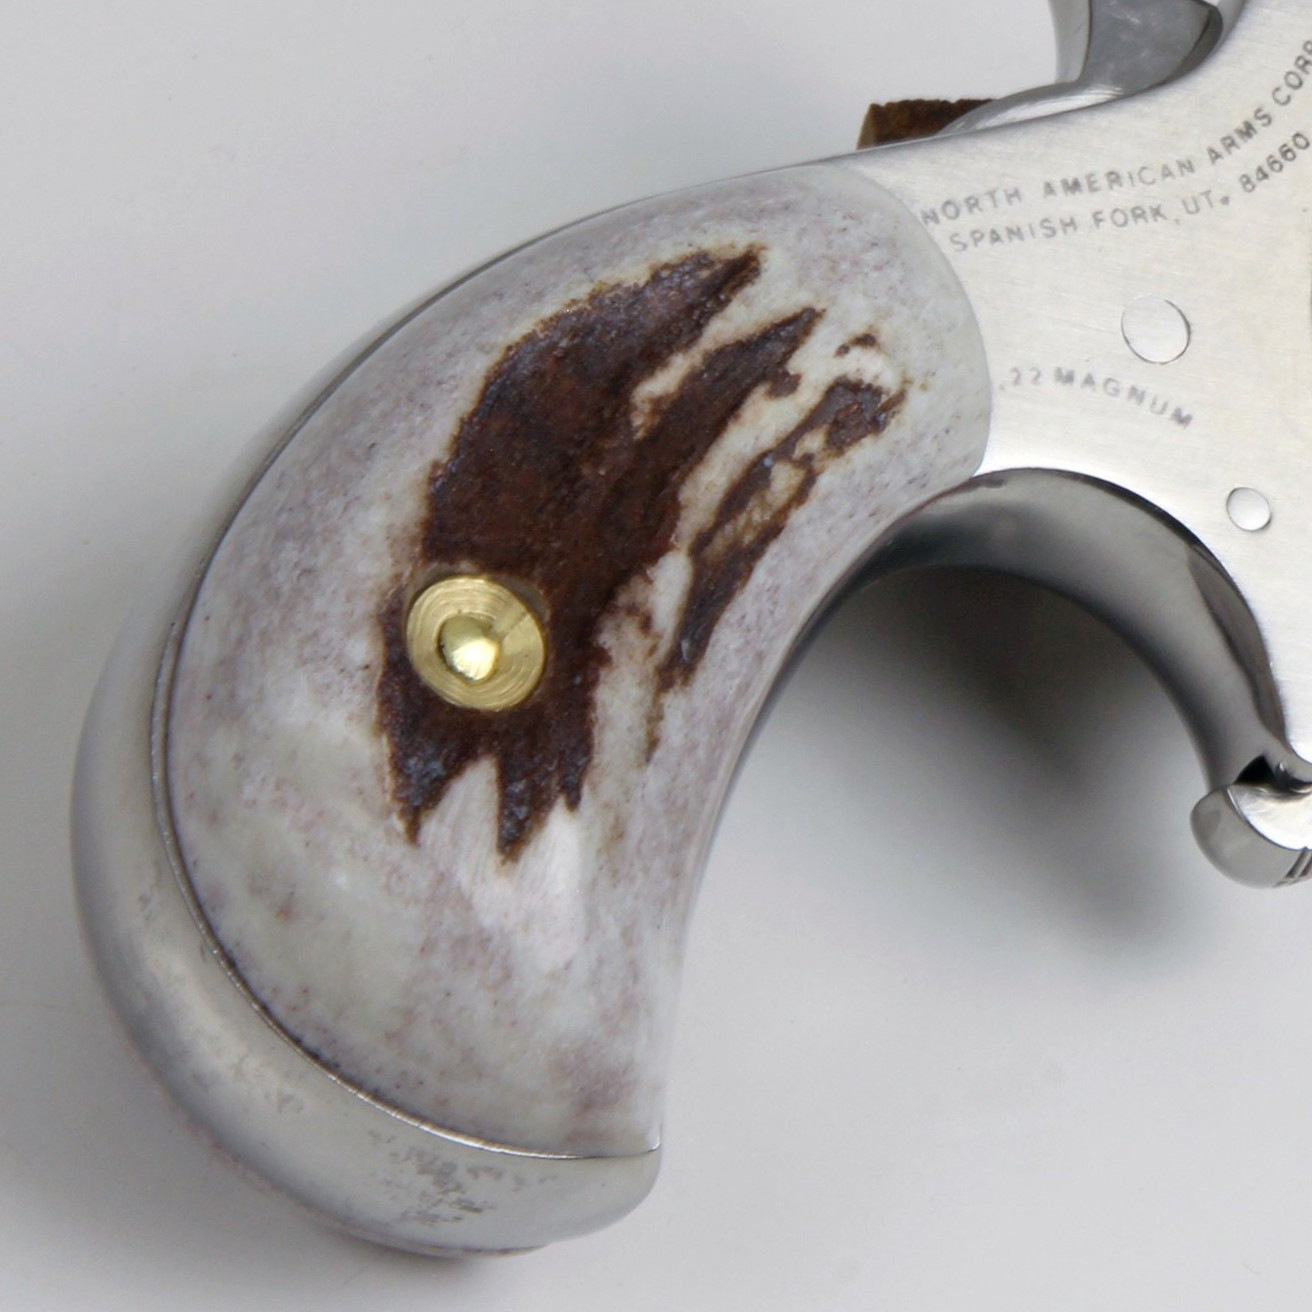 North American Derringer Grips